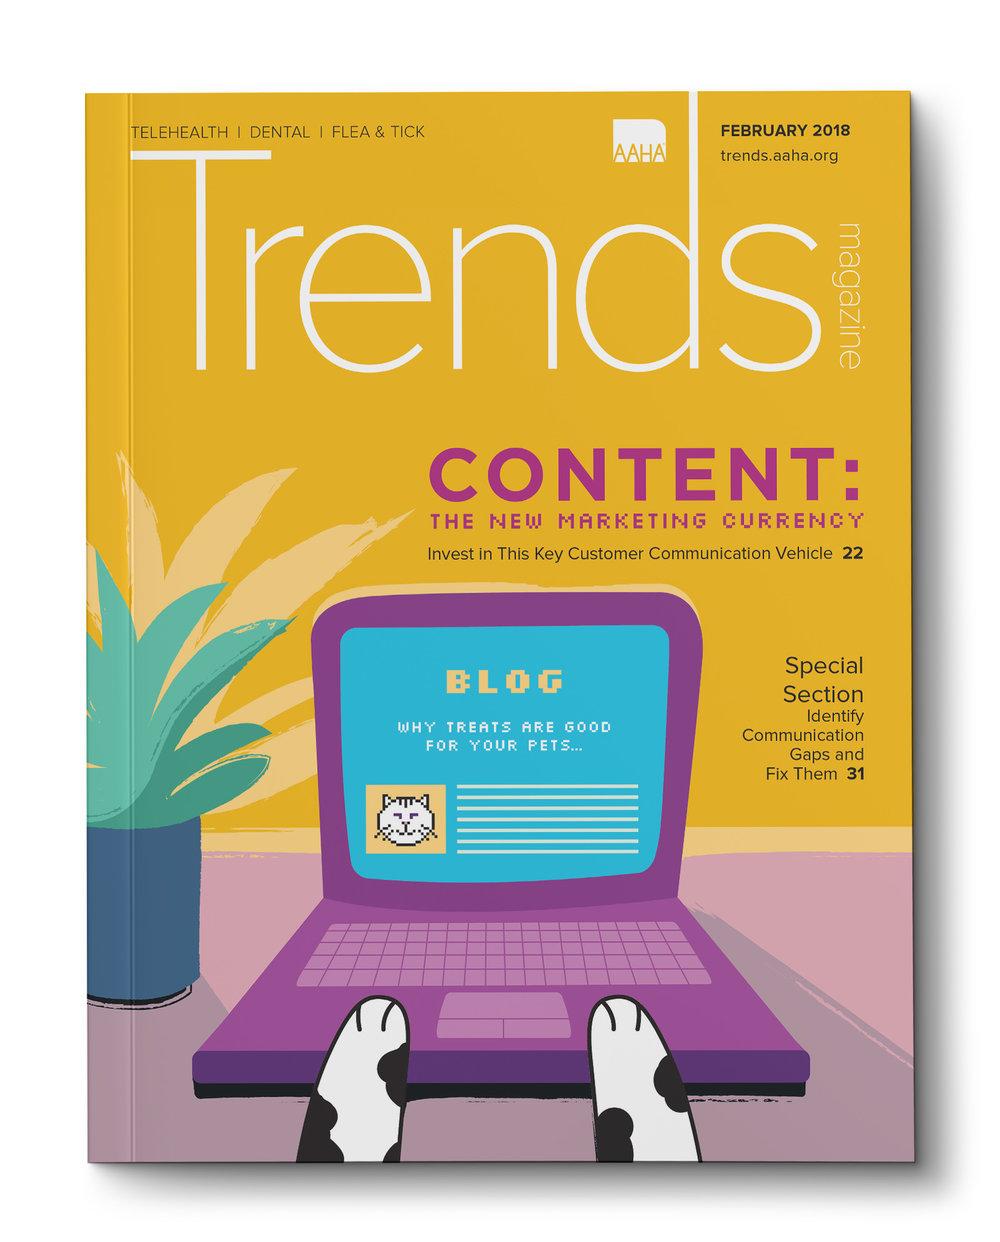 Trends_Feb18.jpg